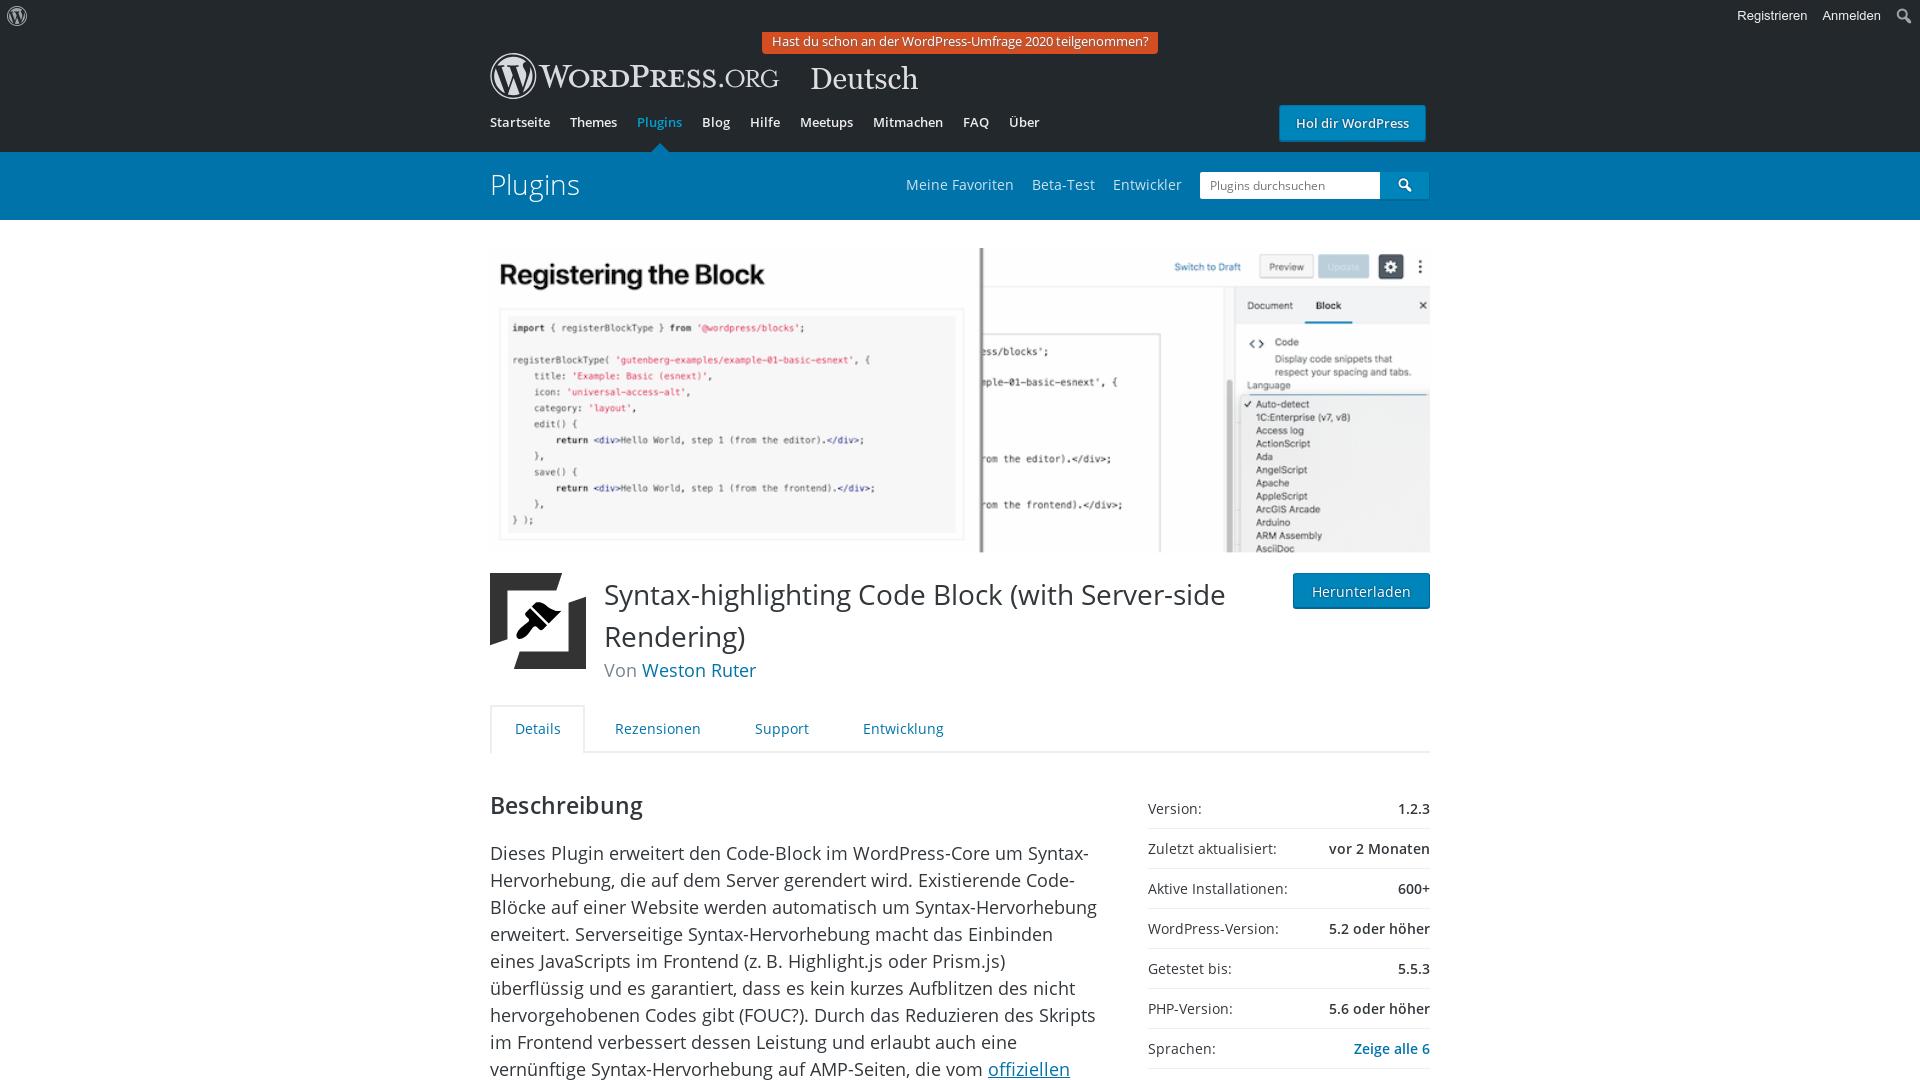 https://de.wordpress.org/plugins/syntax-highlighting-code-block/